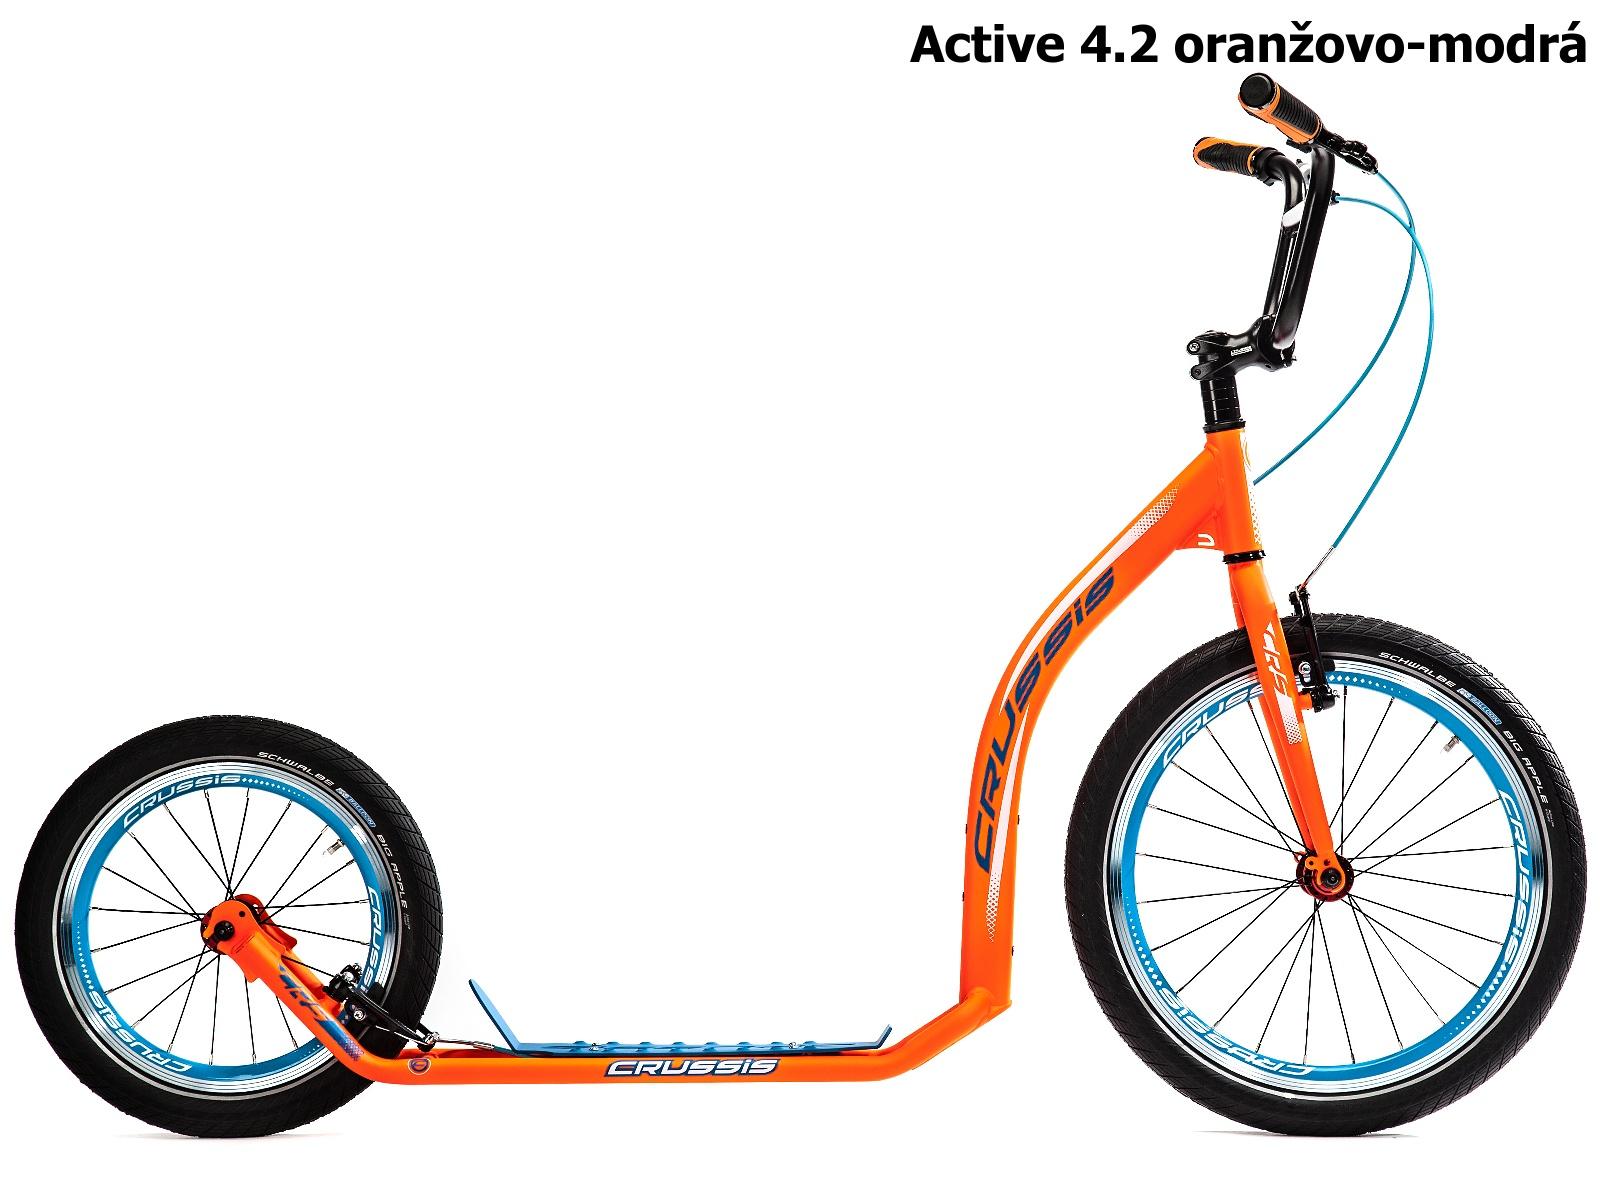 Koloběžka CRUSSIS Active 4.2 oranžovo-modrá